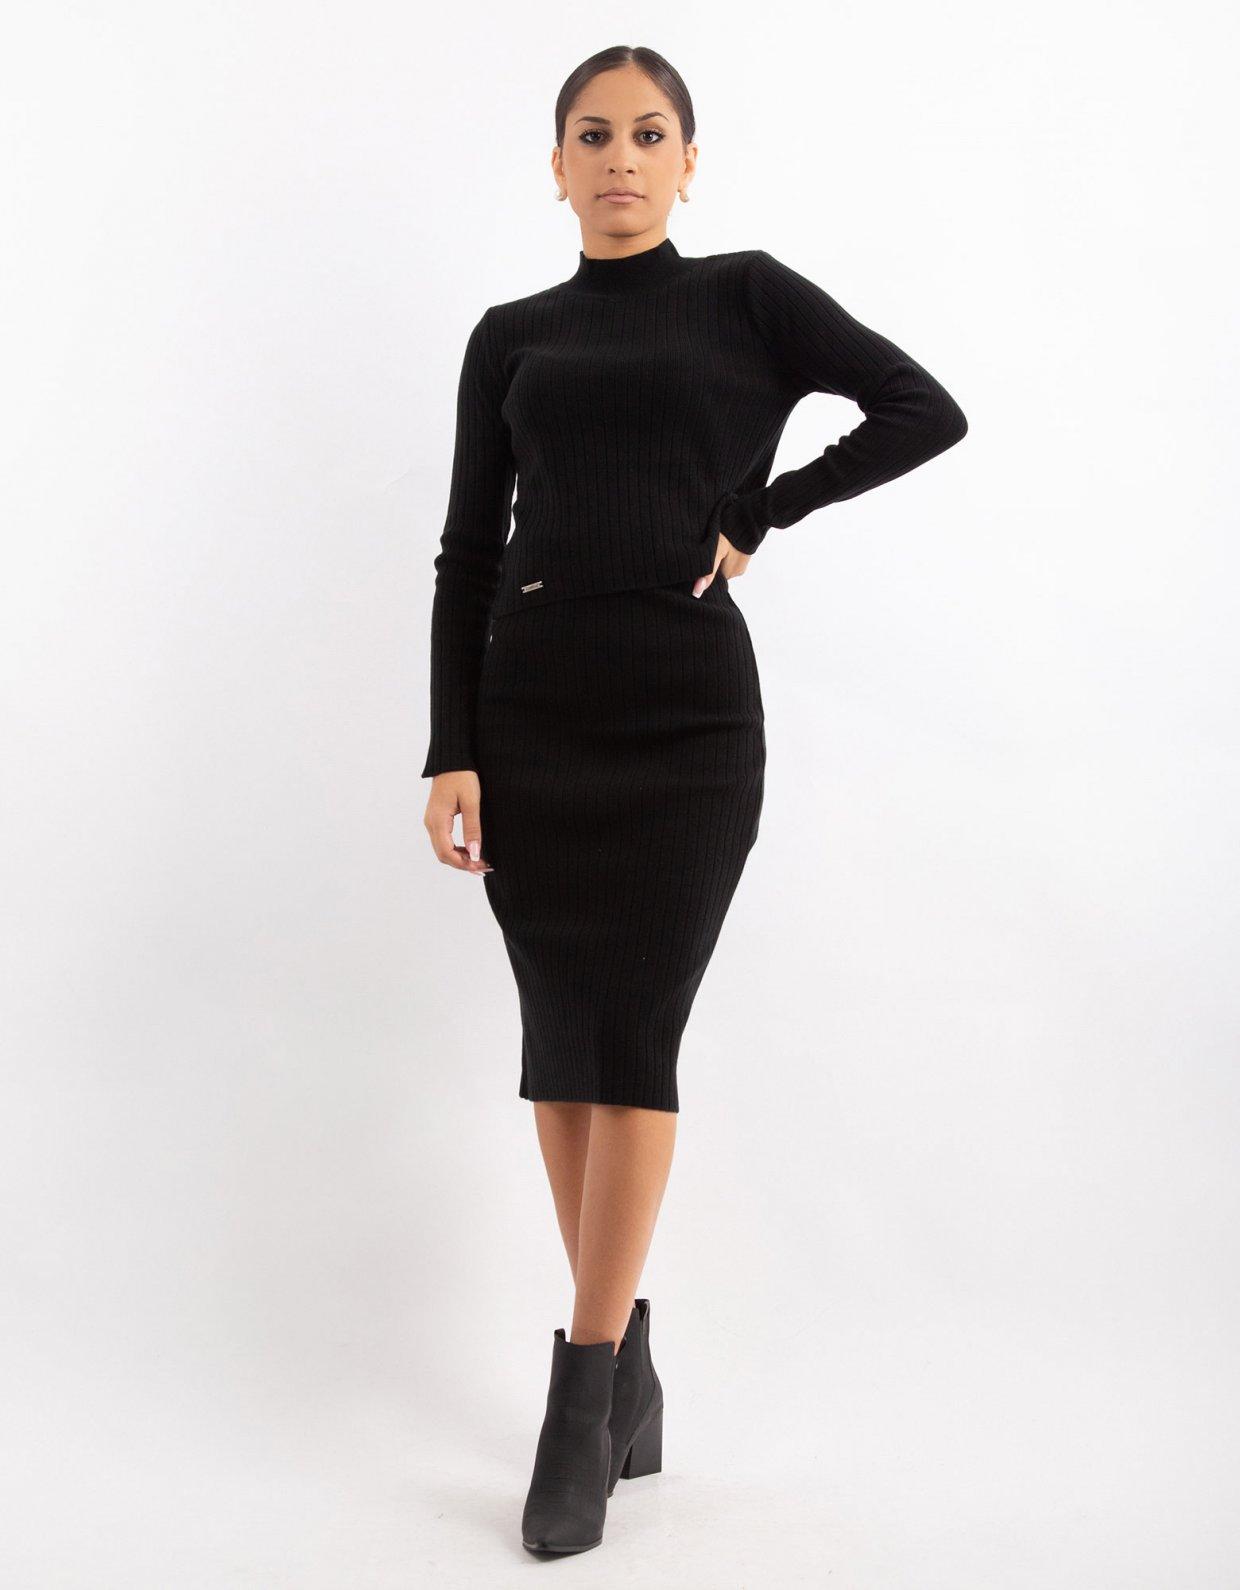 Combos Knitwear Combos W16 – Black rib midi skirt